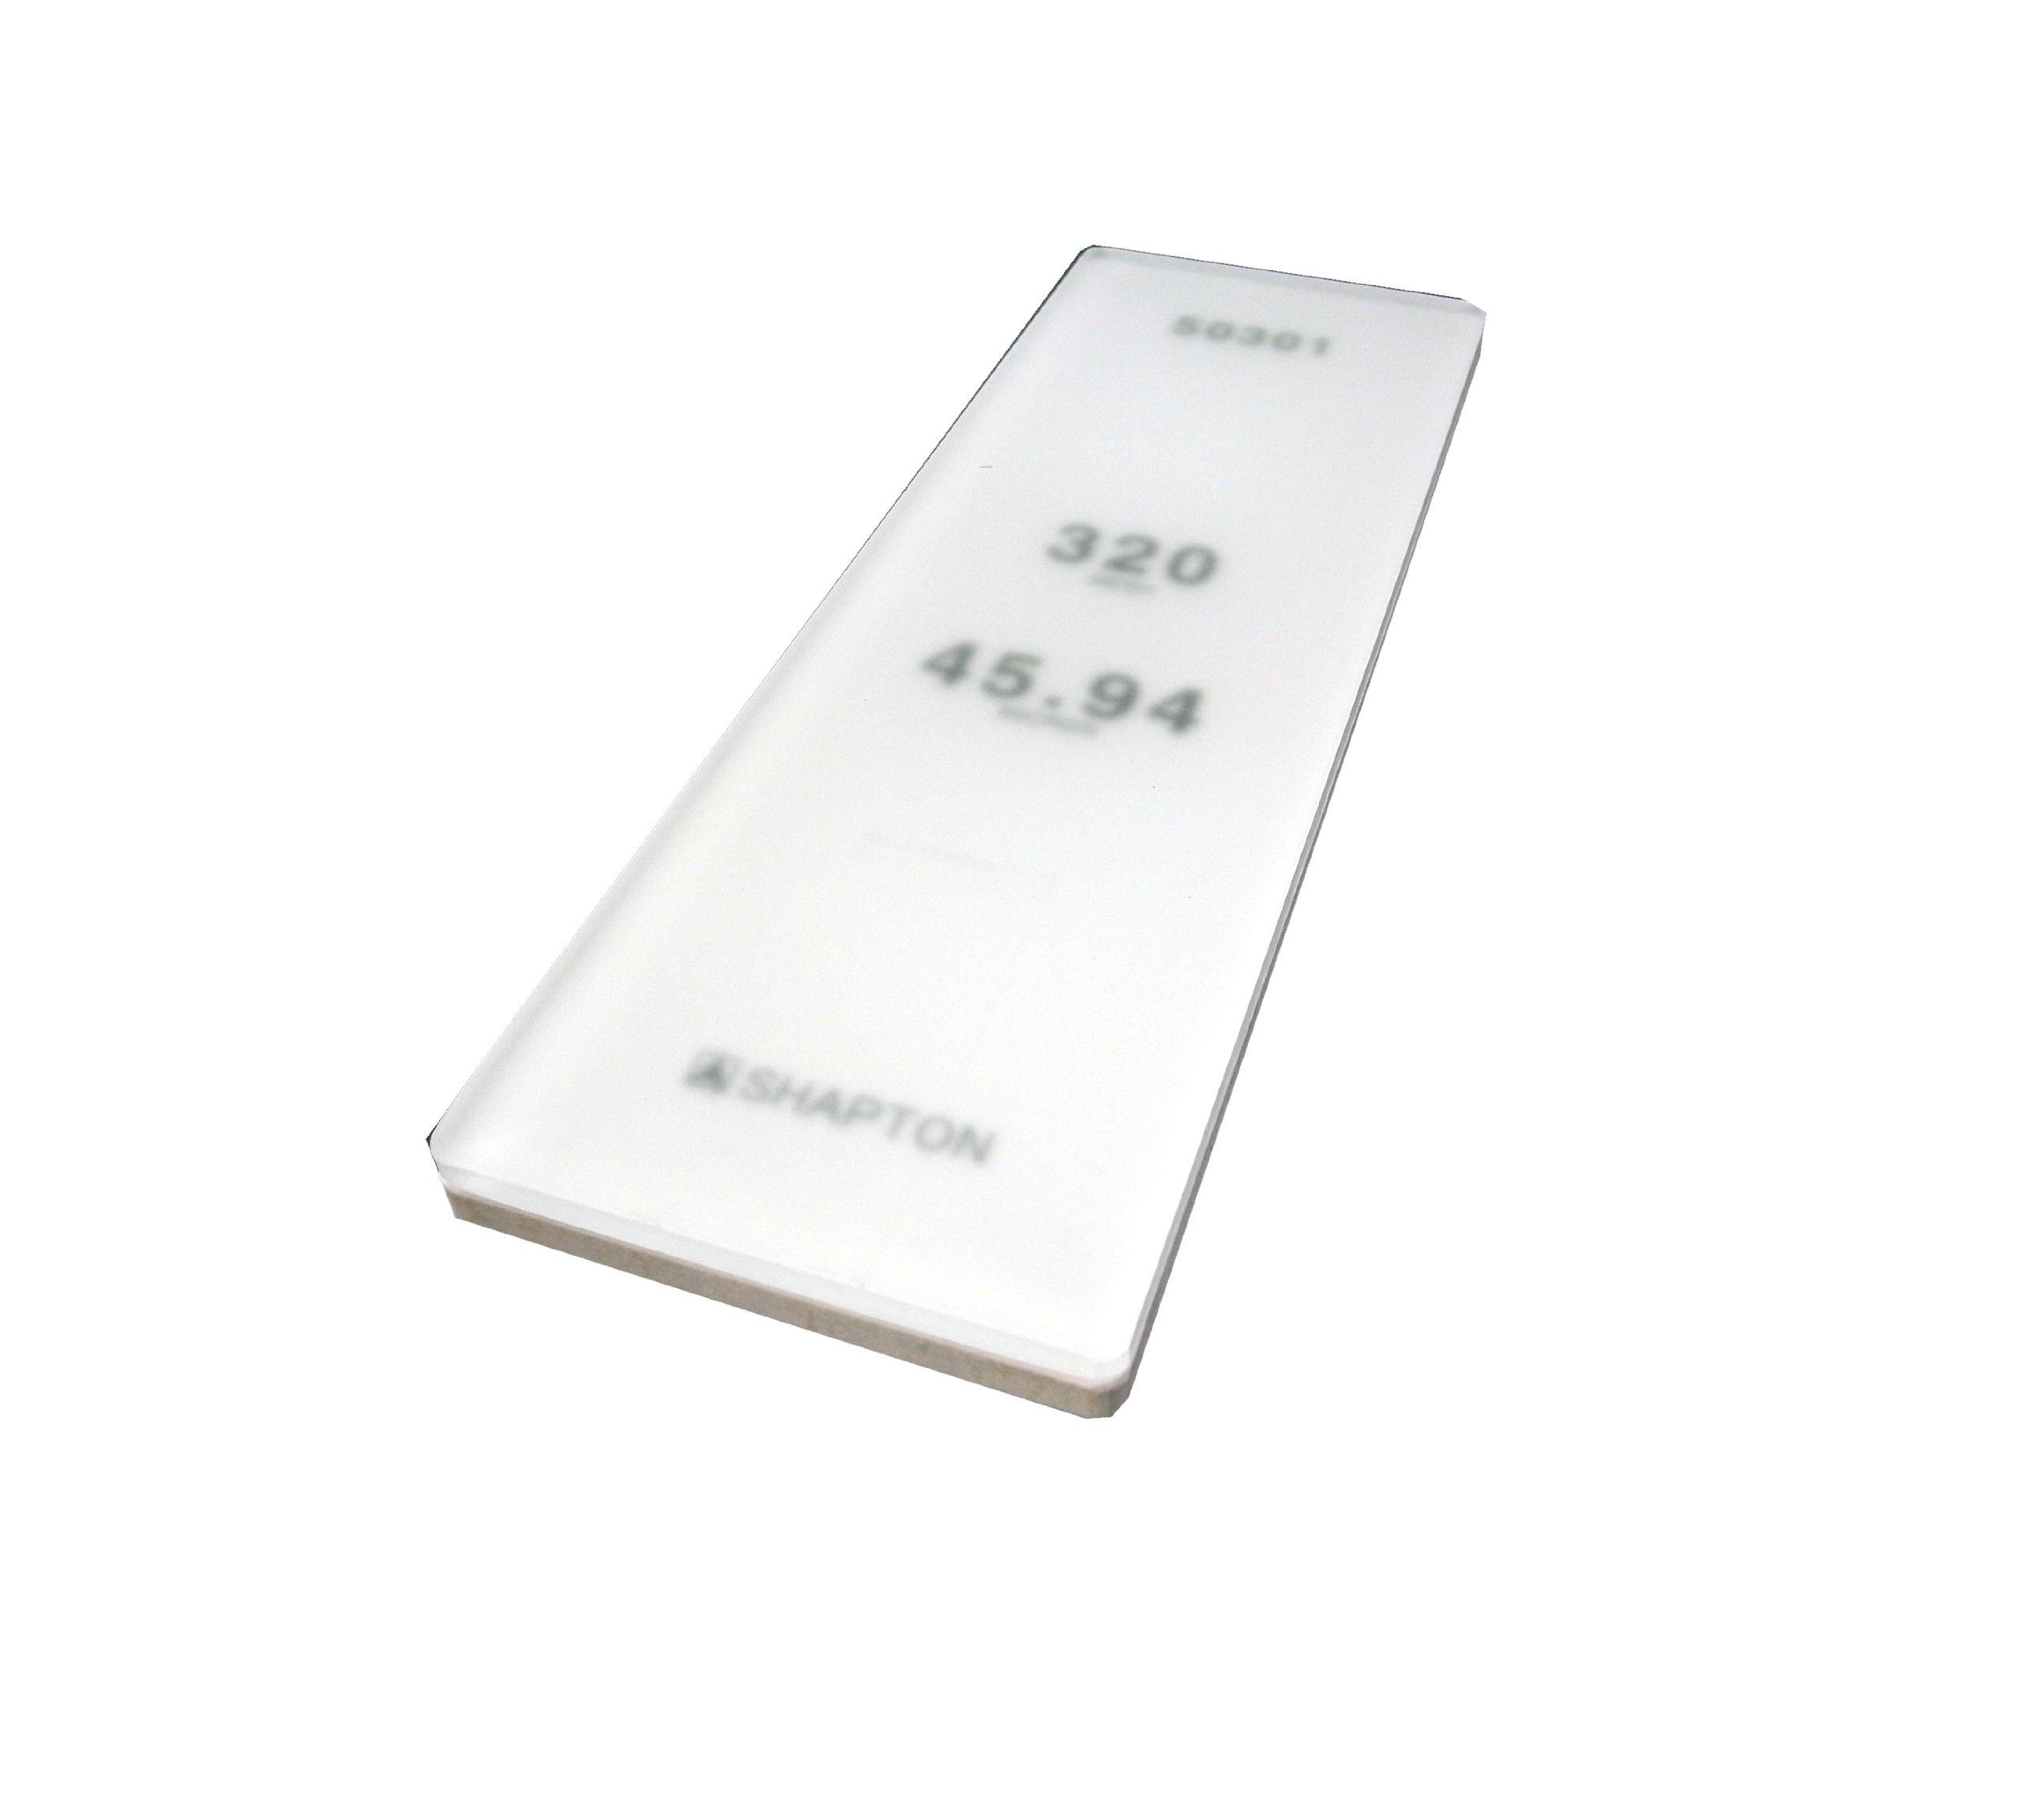 Shapton Glass Stone 320 HR